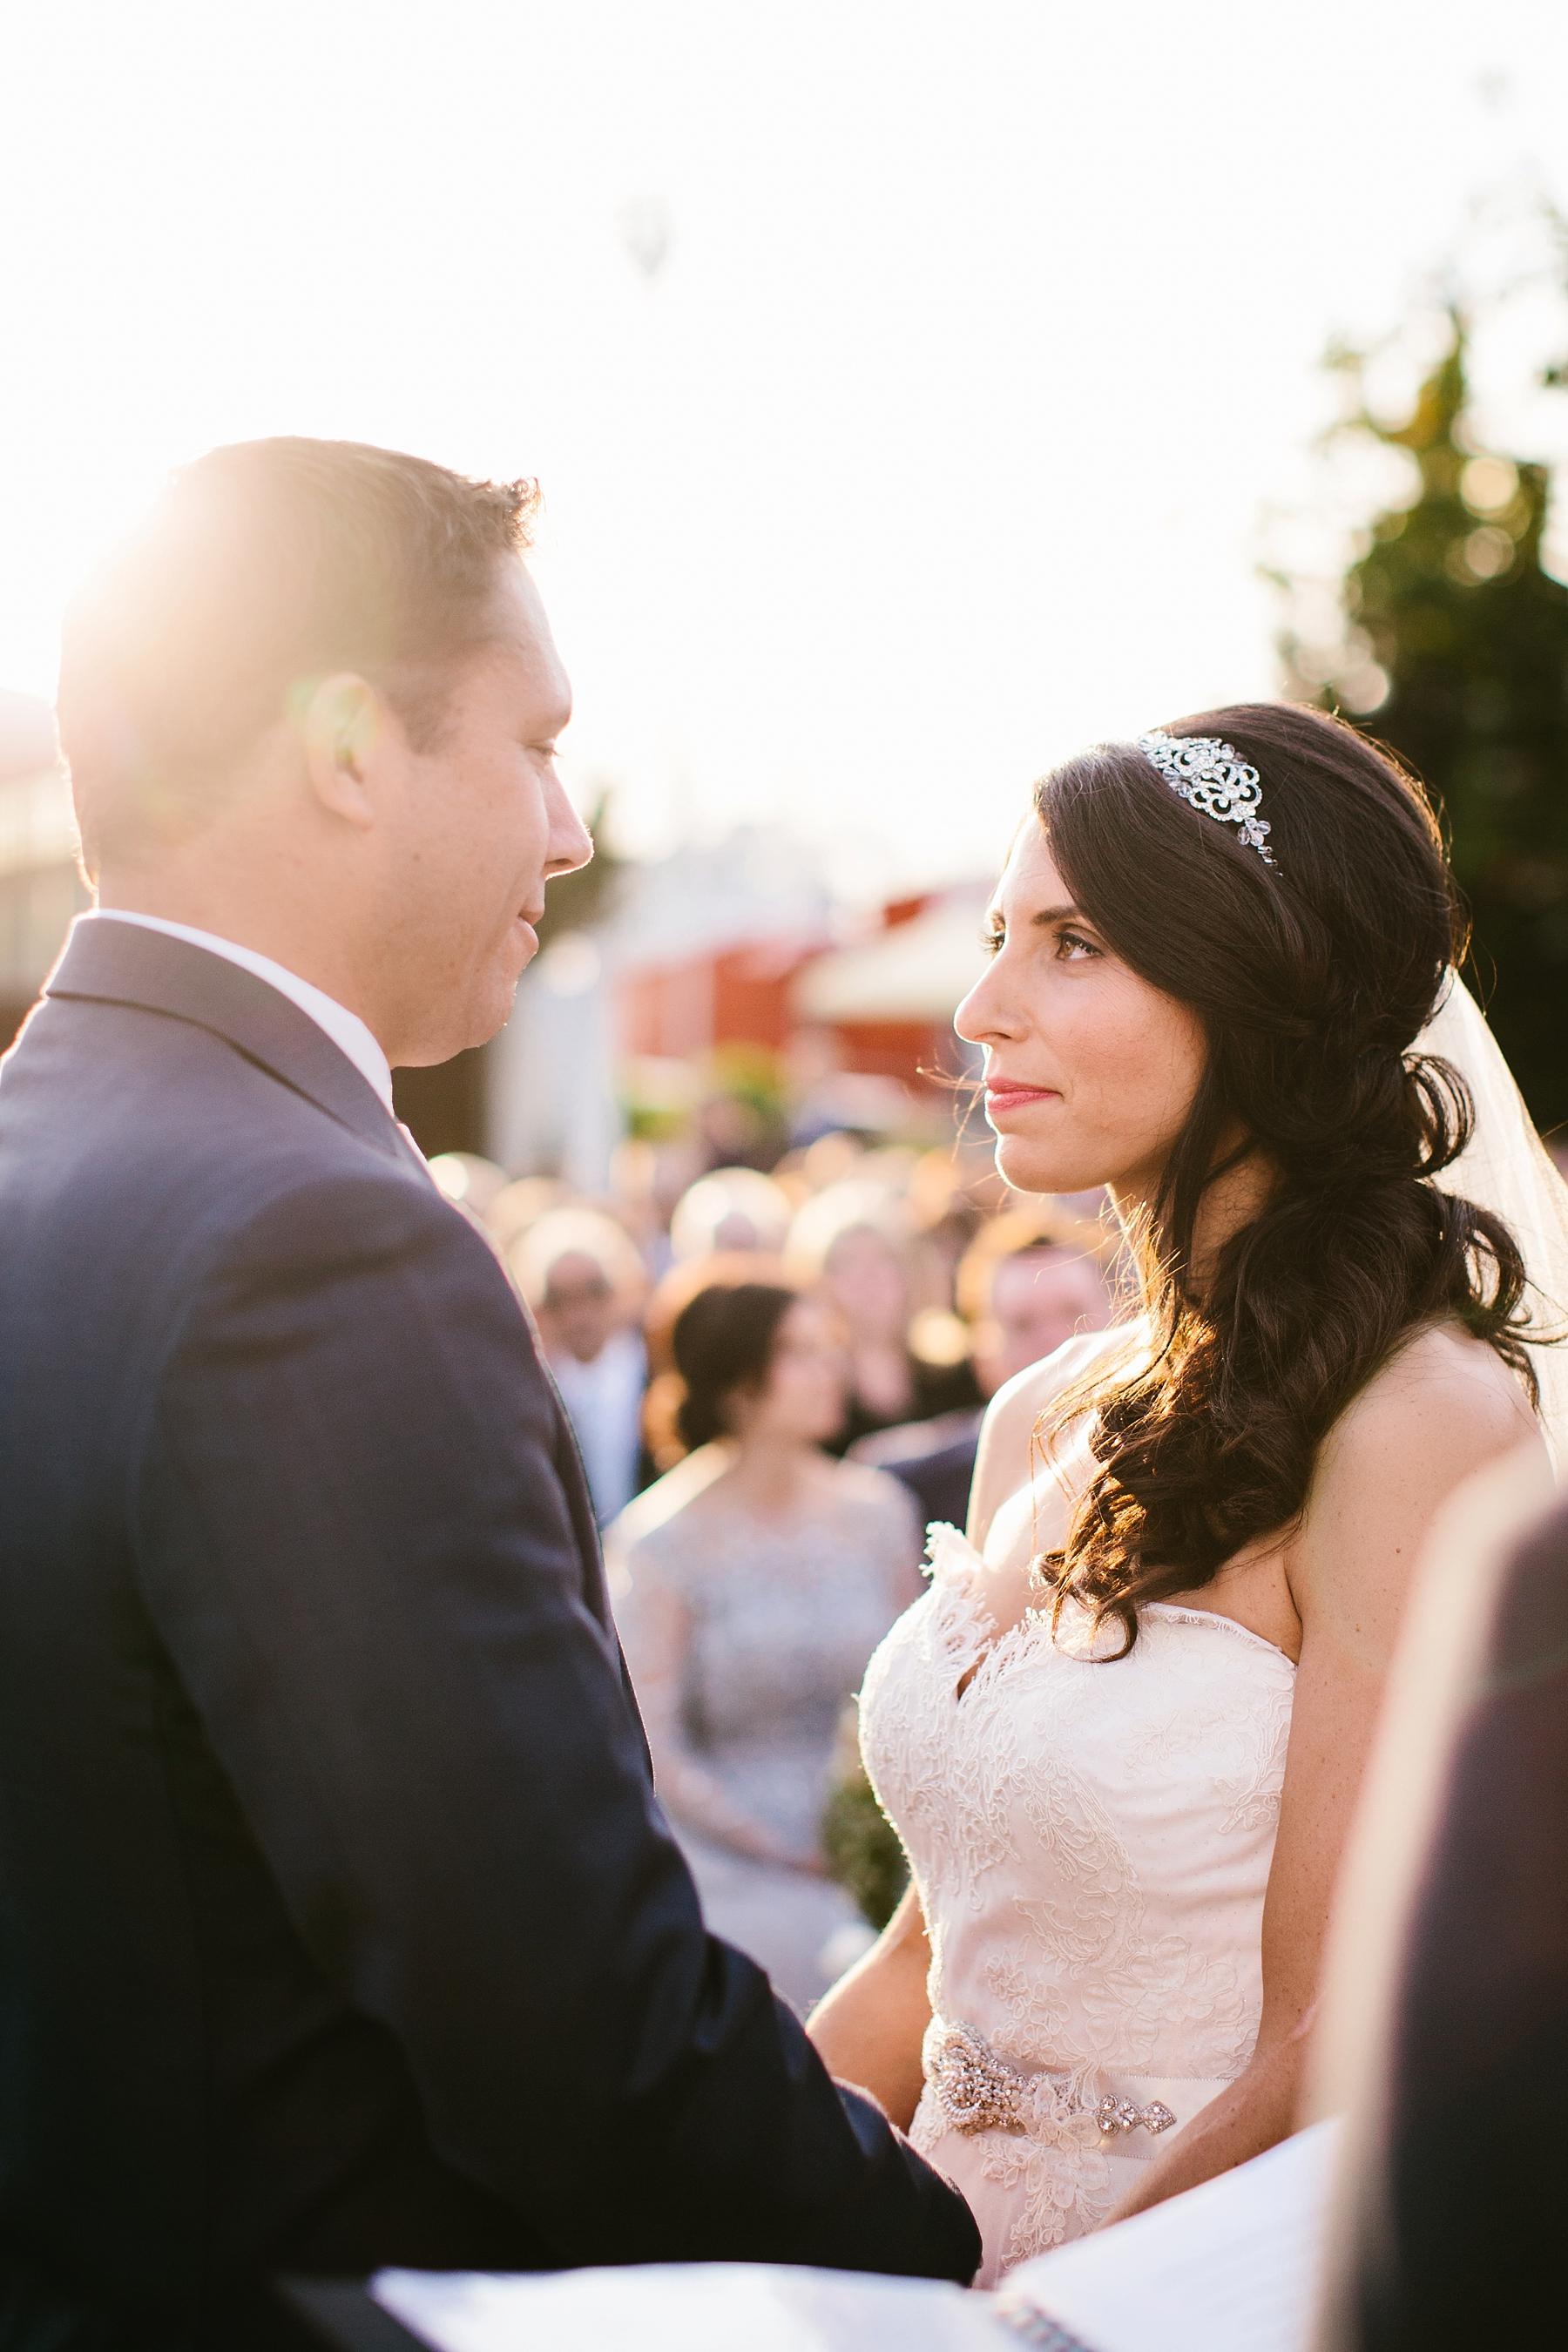 liberty-state-park-wedding-photographer-ny-nj_0035.jpg